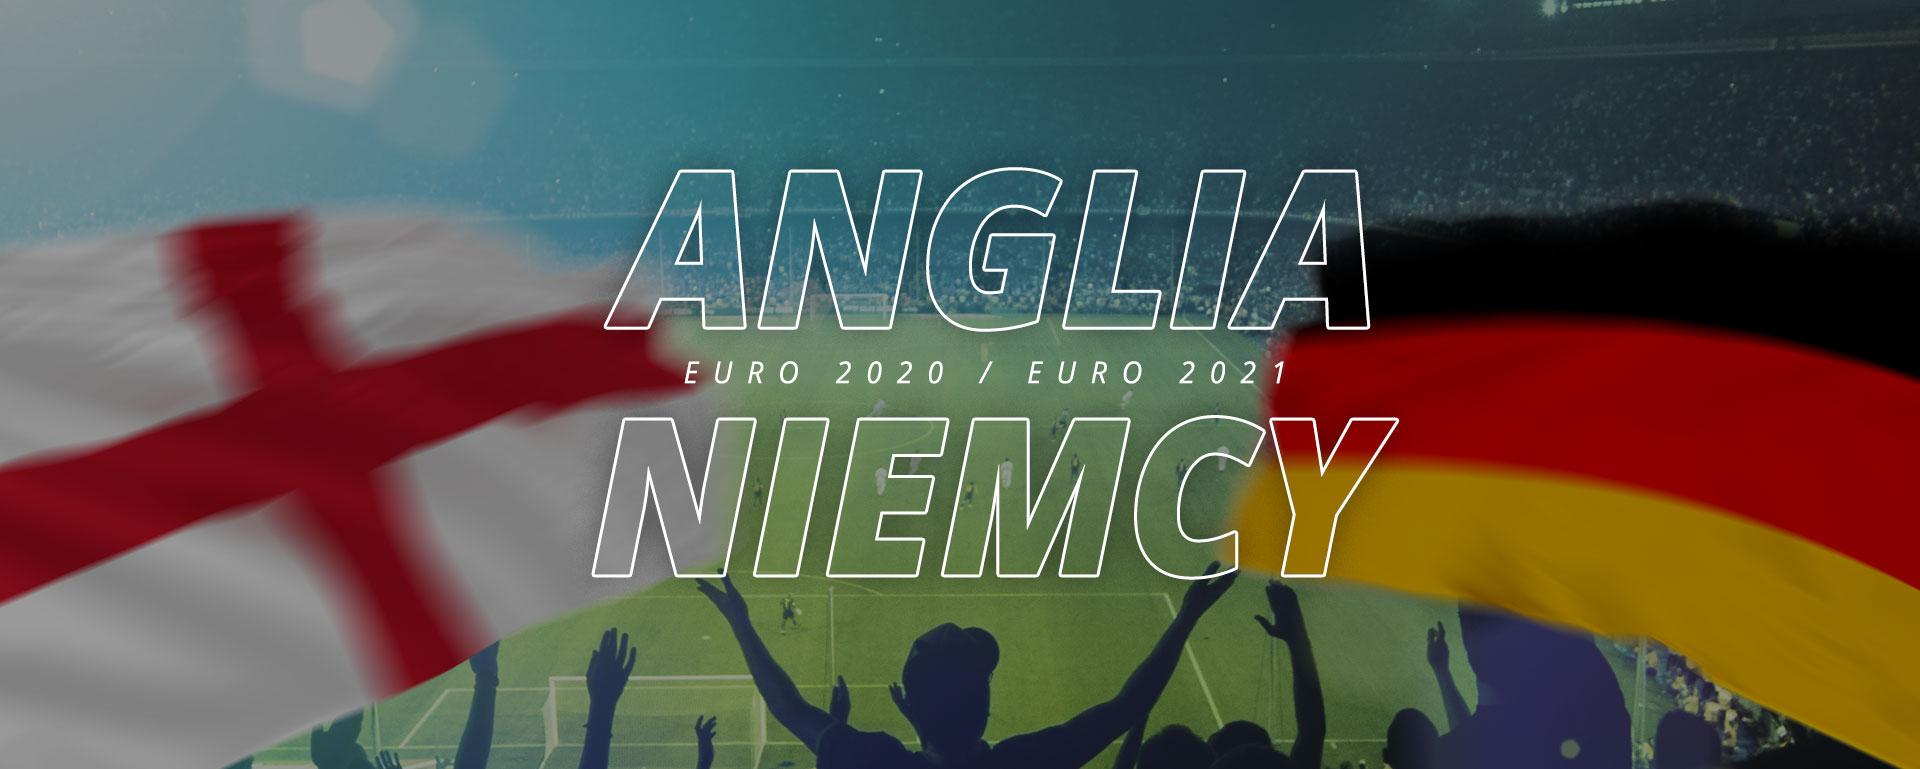 Anglia – Niemcy | 1/8 finału Euro 2020 / Euro 2021